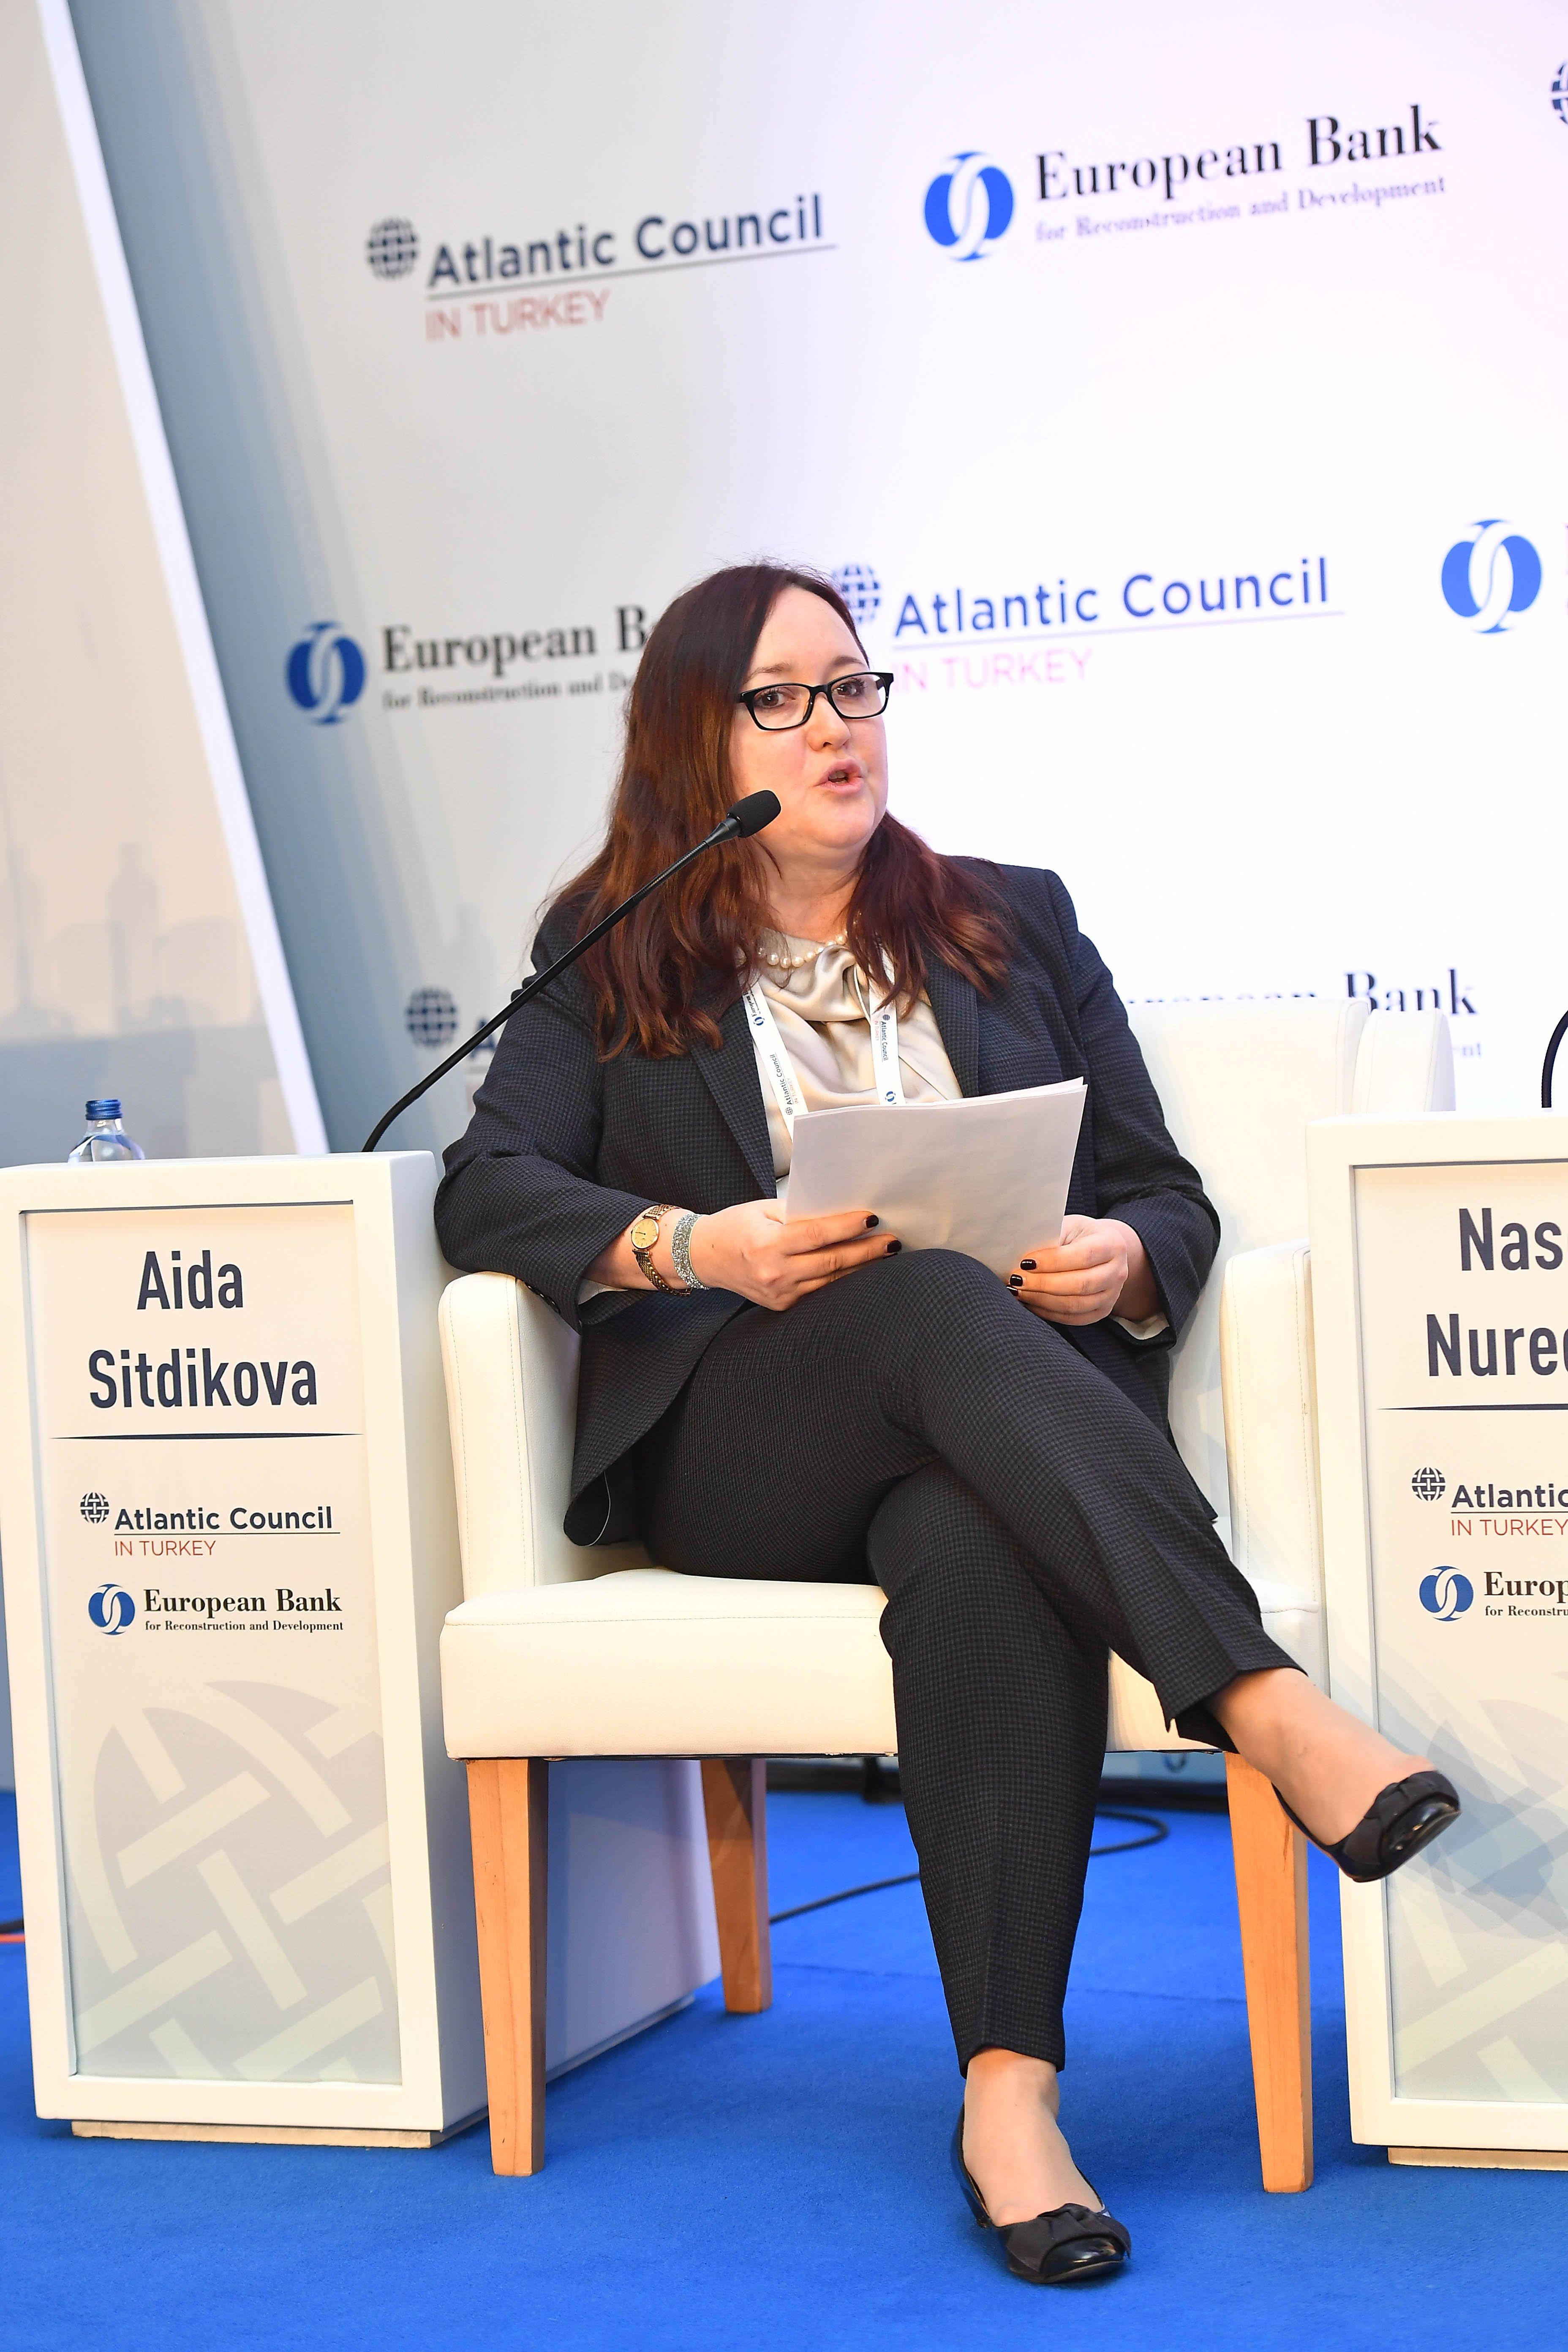 EBRD Director of Energy Eurasia for Sustainable Infrastructure Group Aida Sitdikova.